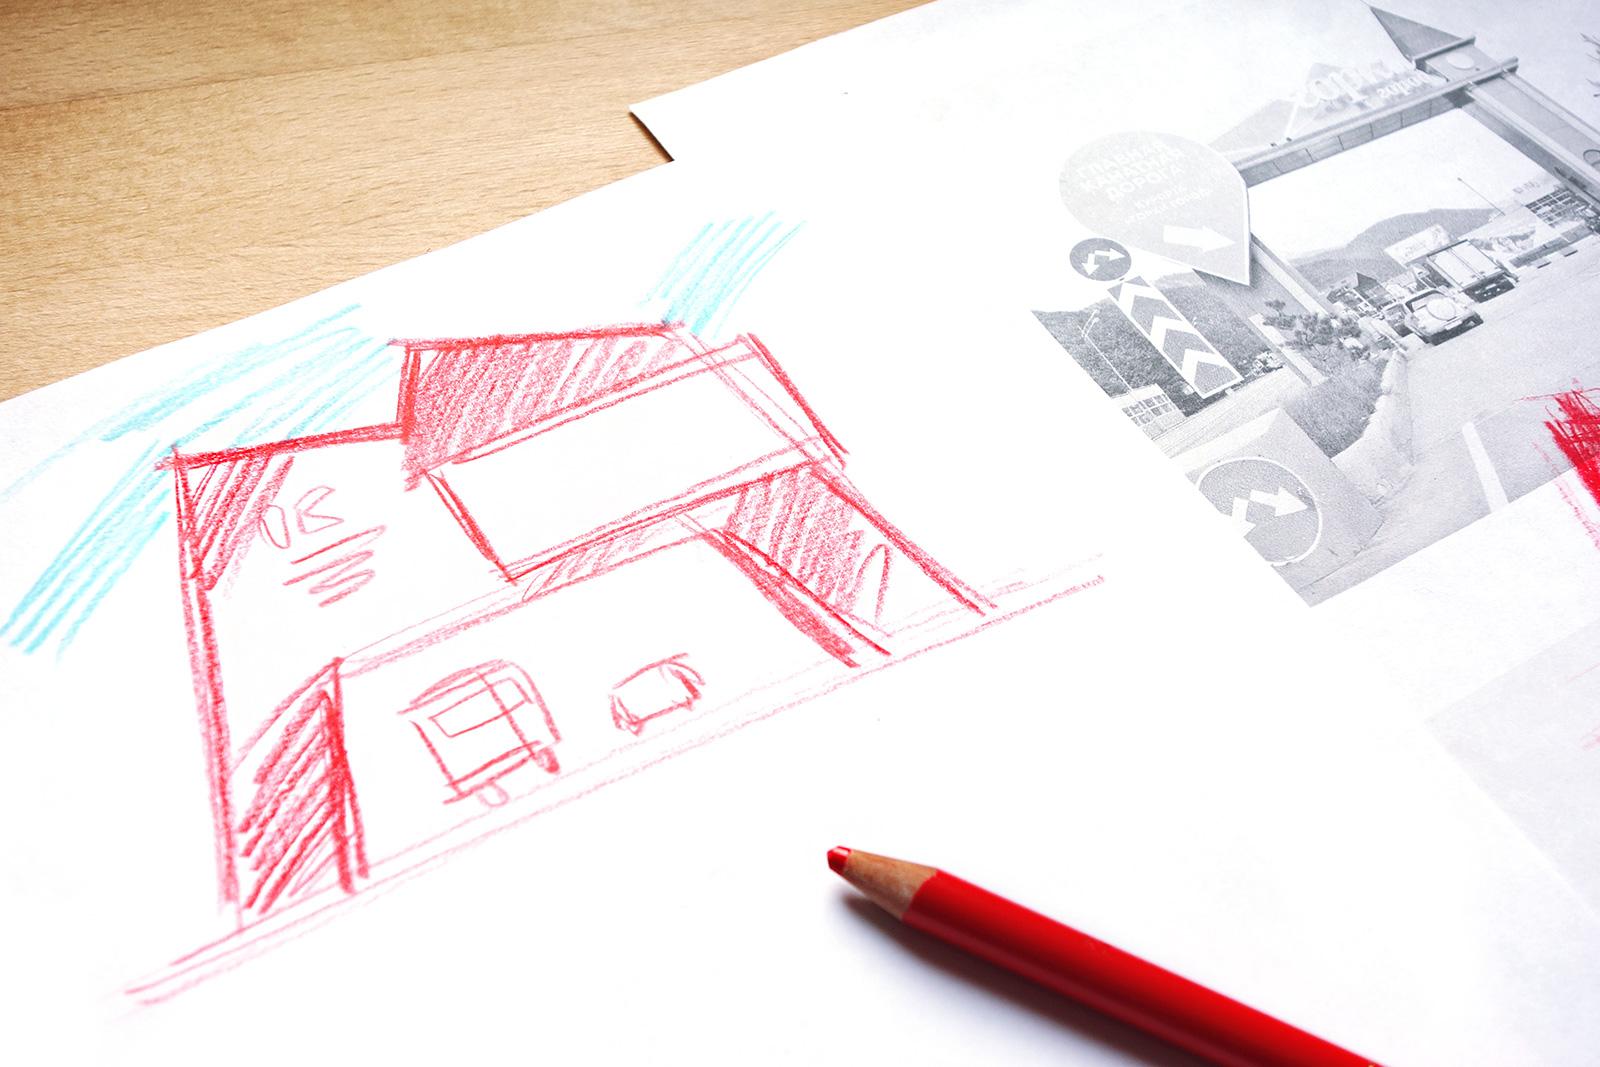 David Avakyan, sketch, Krasnaya Polyana resort, Красная арка, Red arch, graphic design work